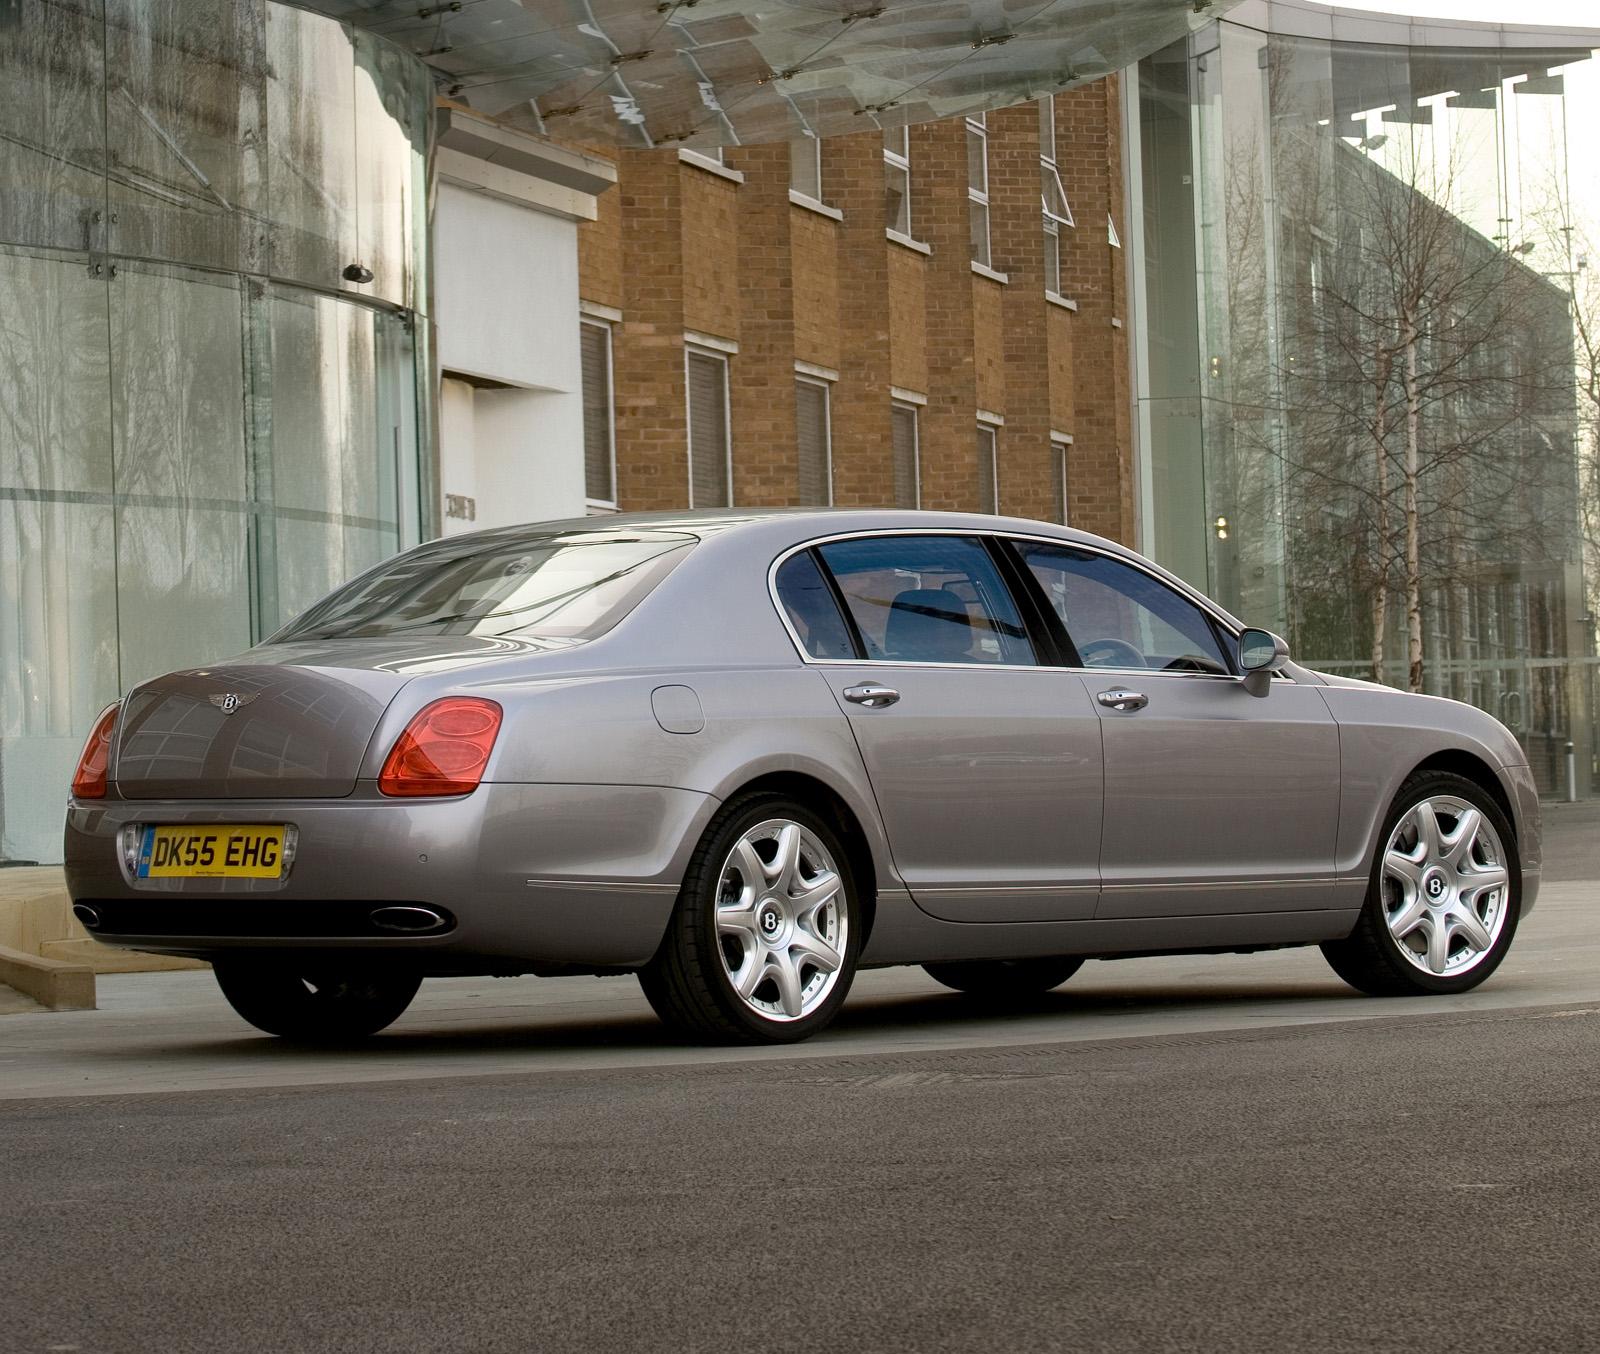 Modellbeschreibung Zum Bentley Continental Flying Spur: VAETH Mercedes-Benz C63 AMG With Up To 680 Horsepower